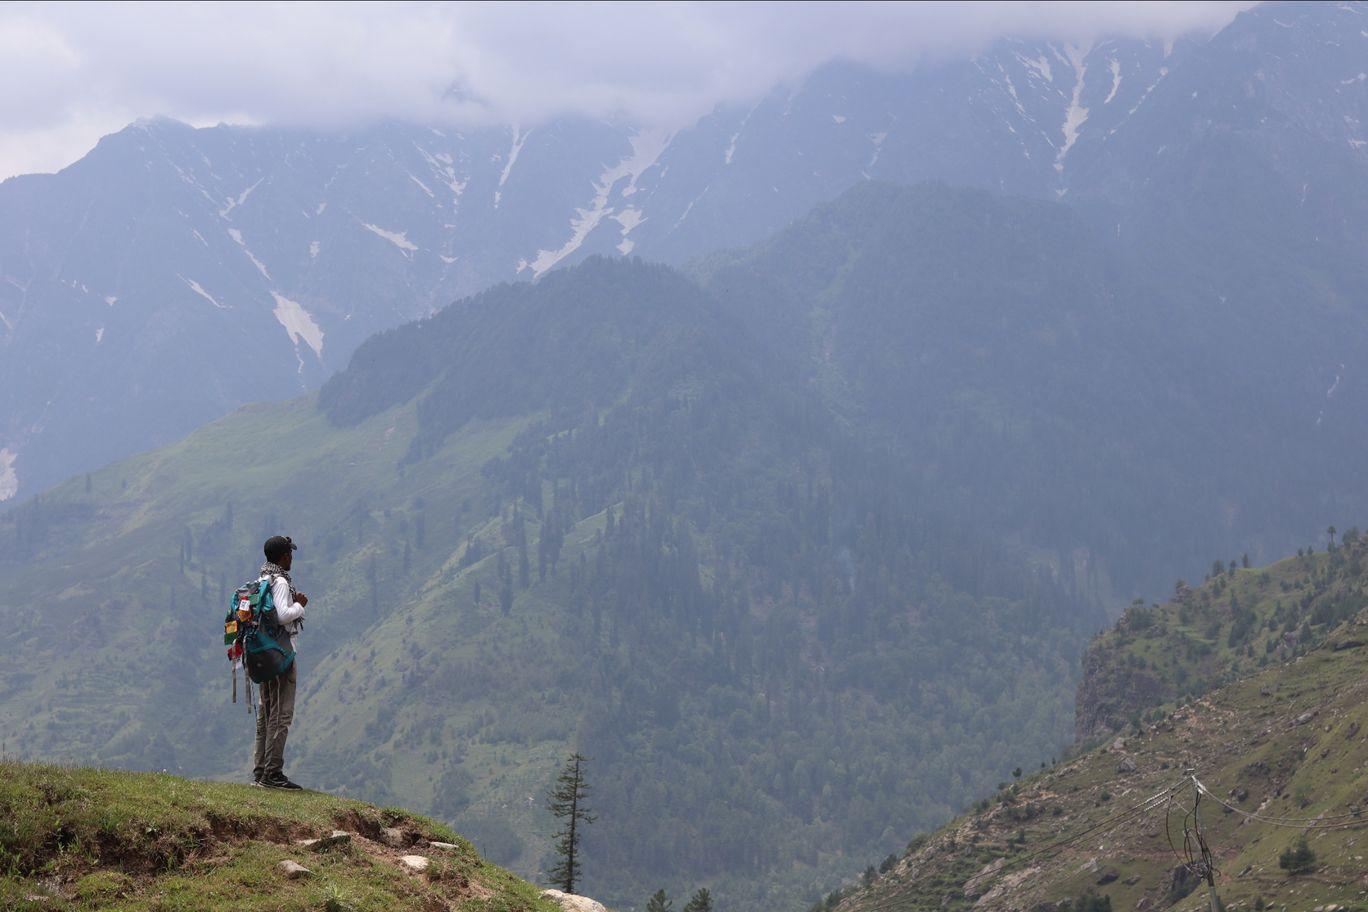 Photo of Solang Valley By Deepak Upadhyaya